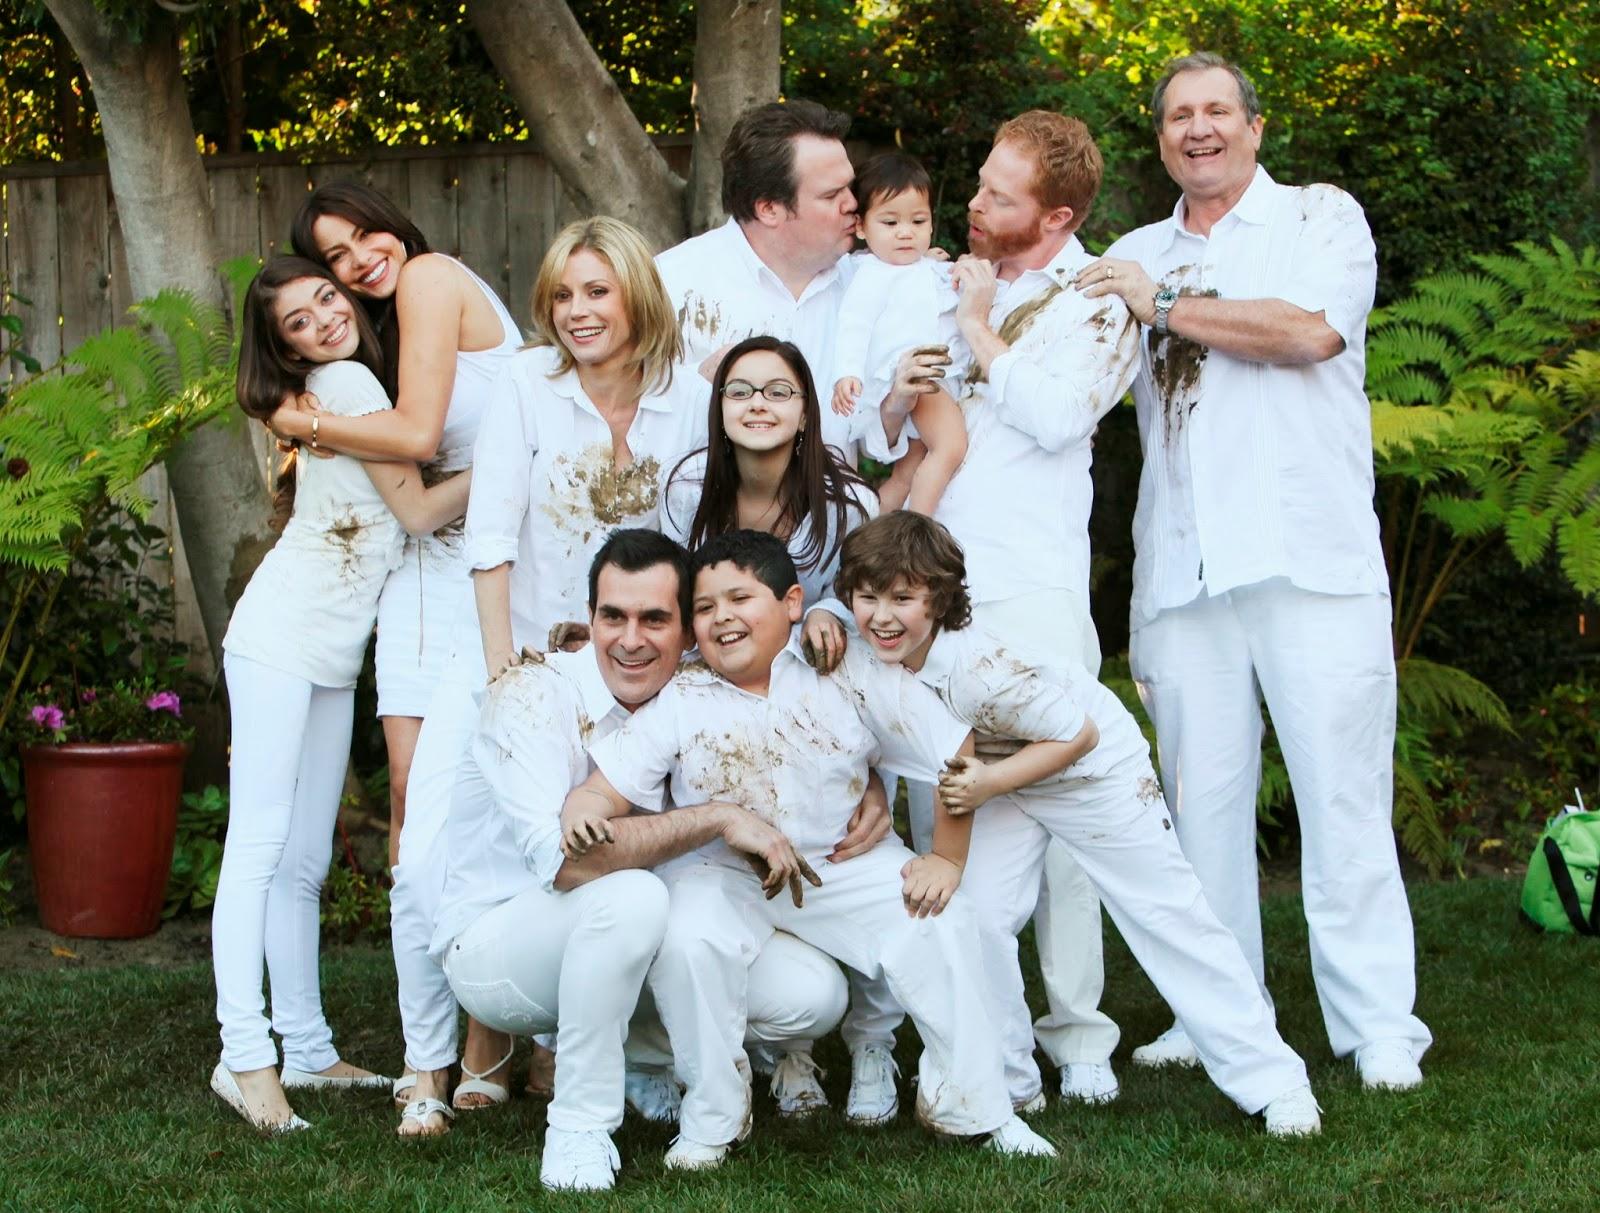 Modern-Family-Emmys-2013-Mejor-comedia